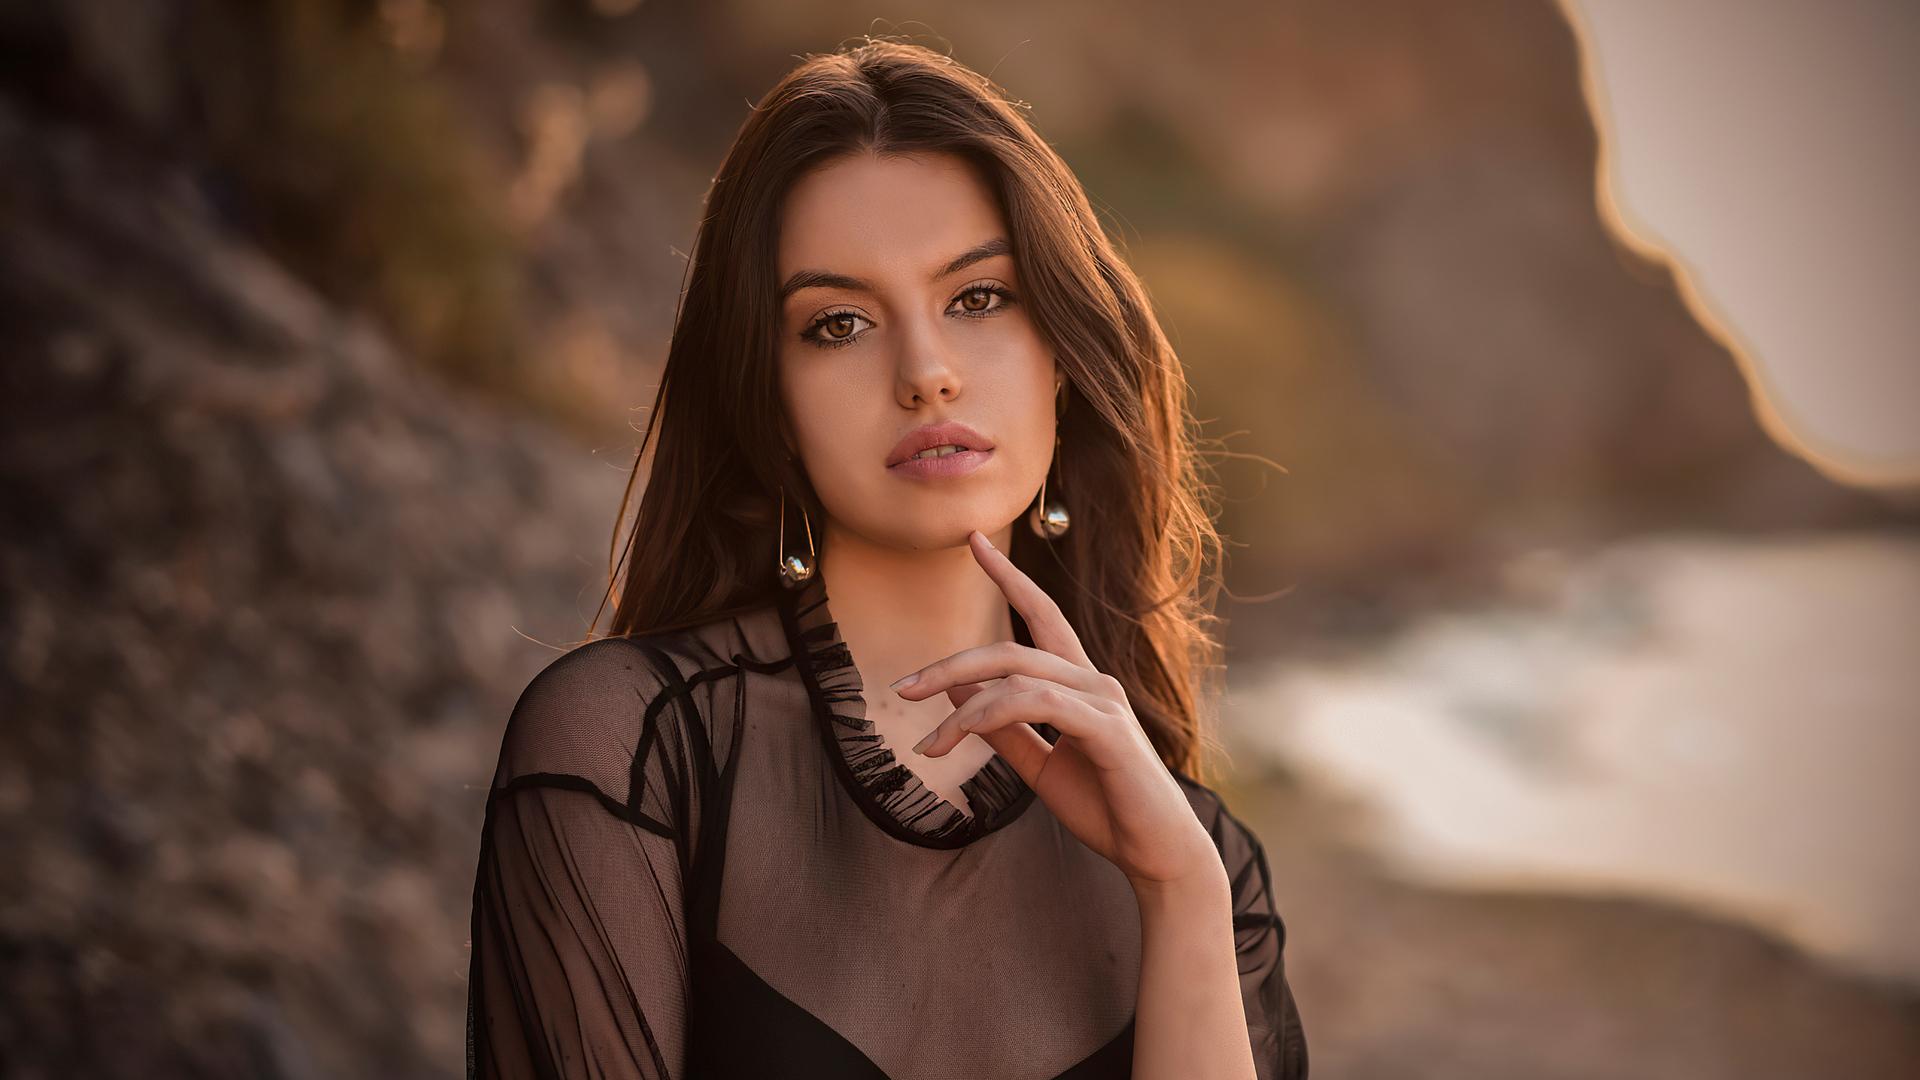 Download Carla Sonre, model, girl, outdoor wallpaper